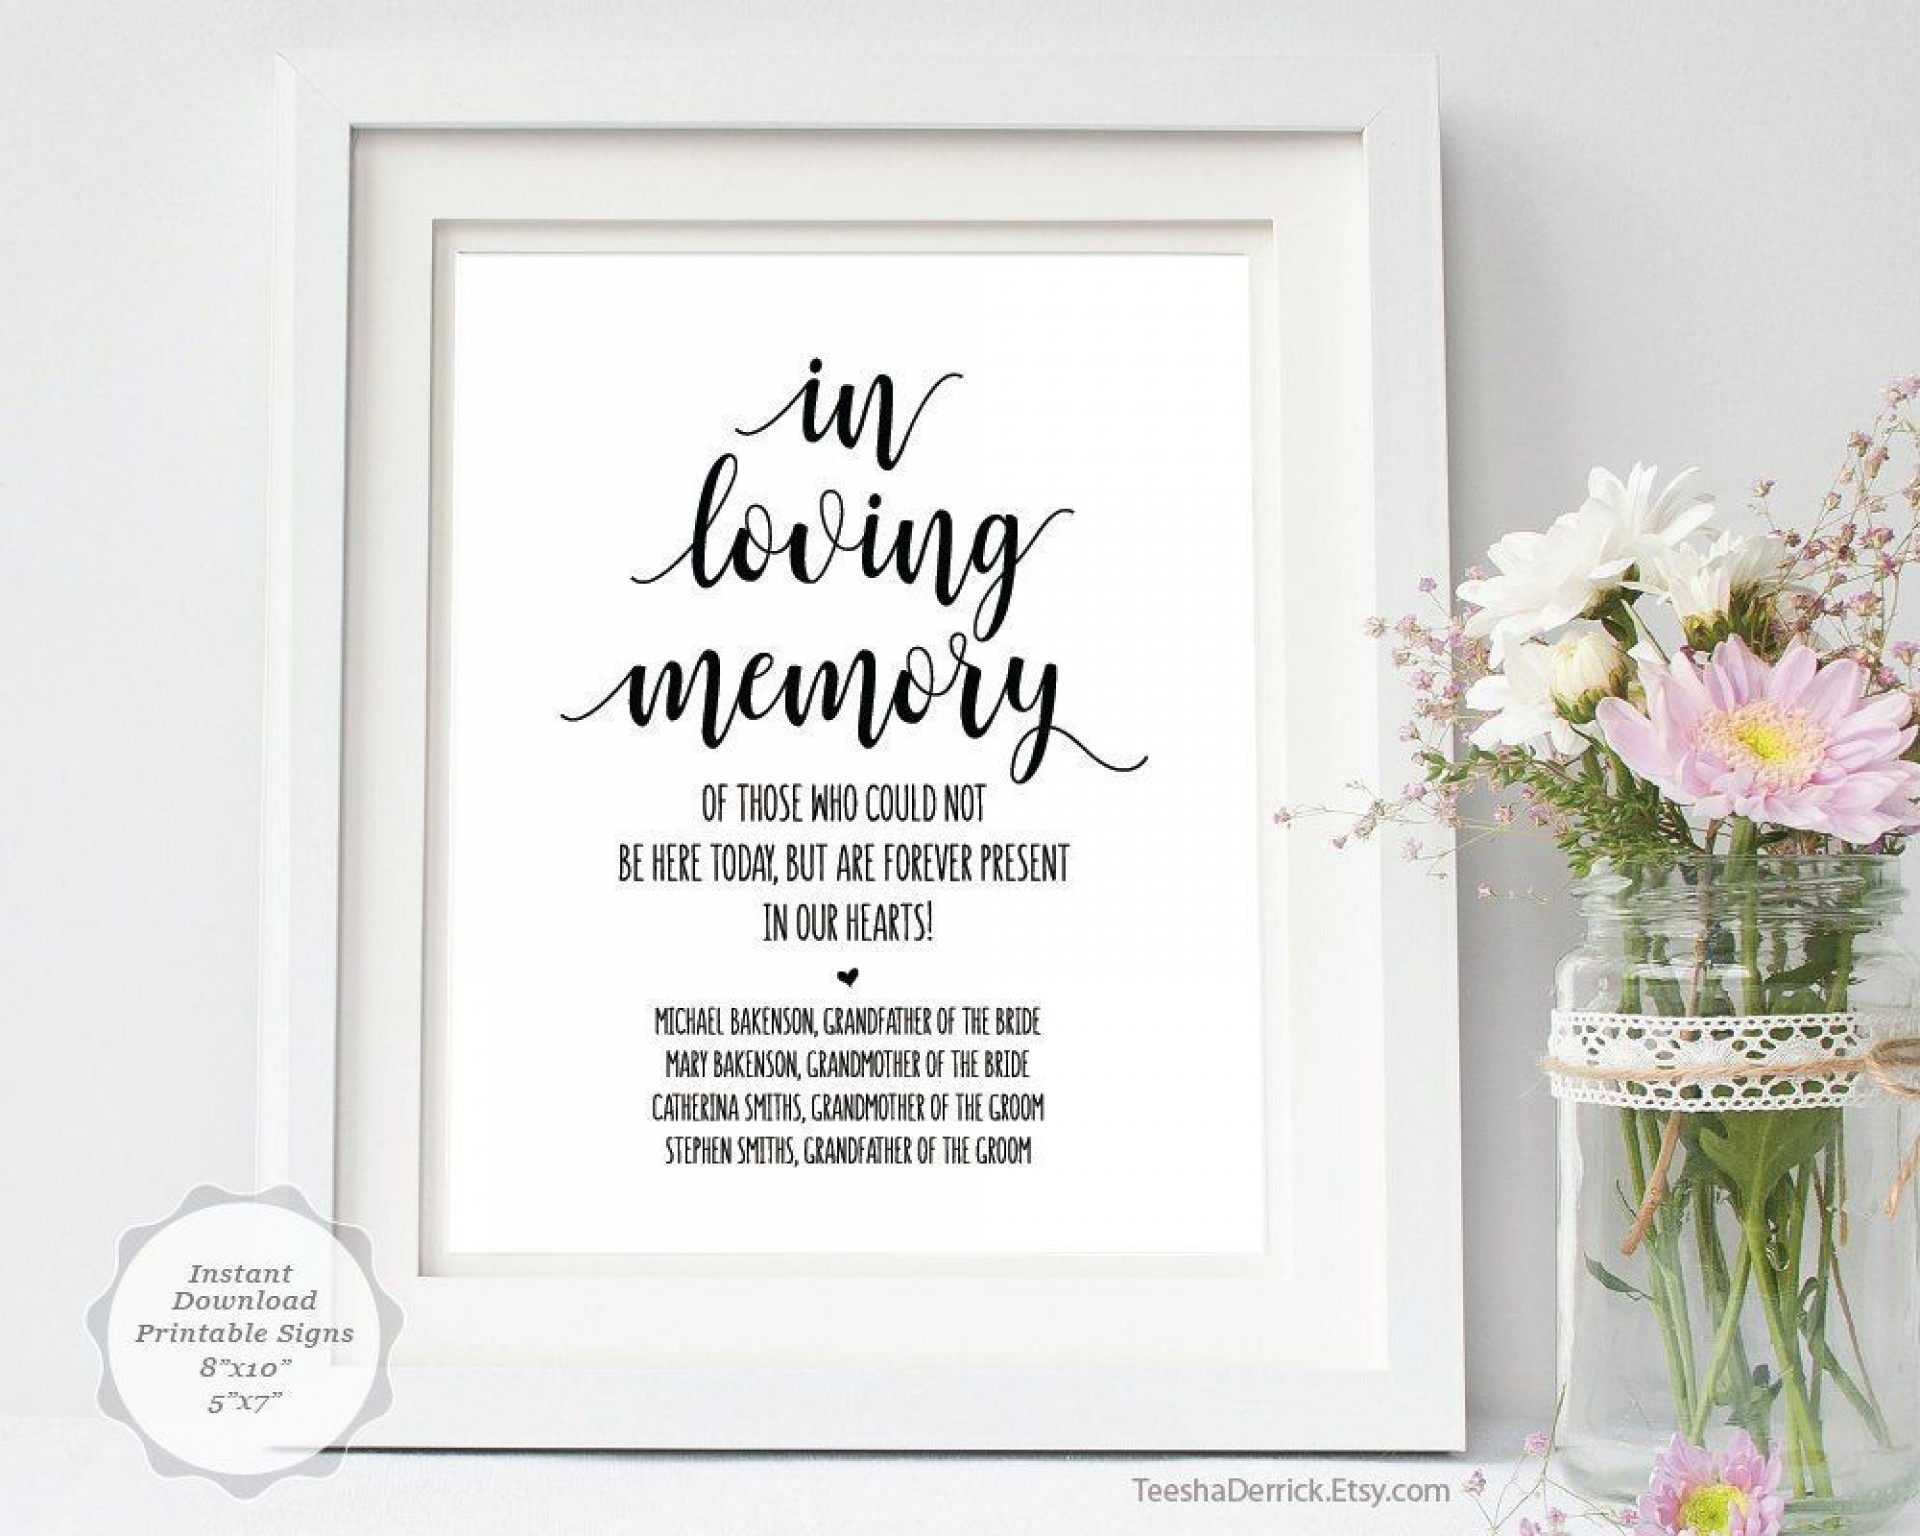 002 Fantastic In Loving Memory Template Image  Templates Word1920